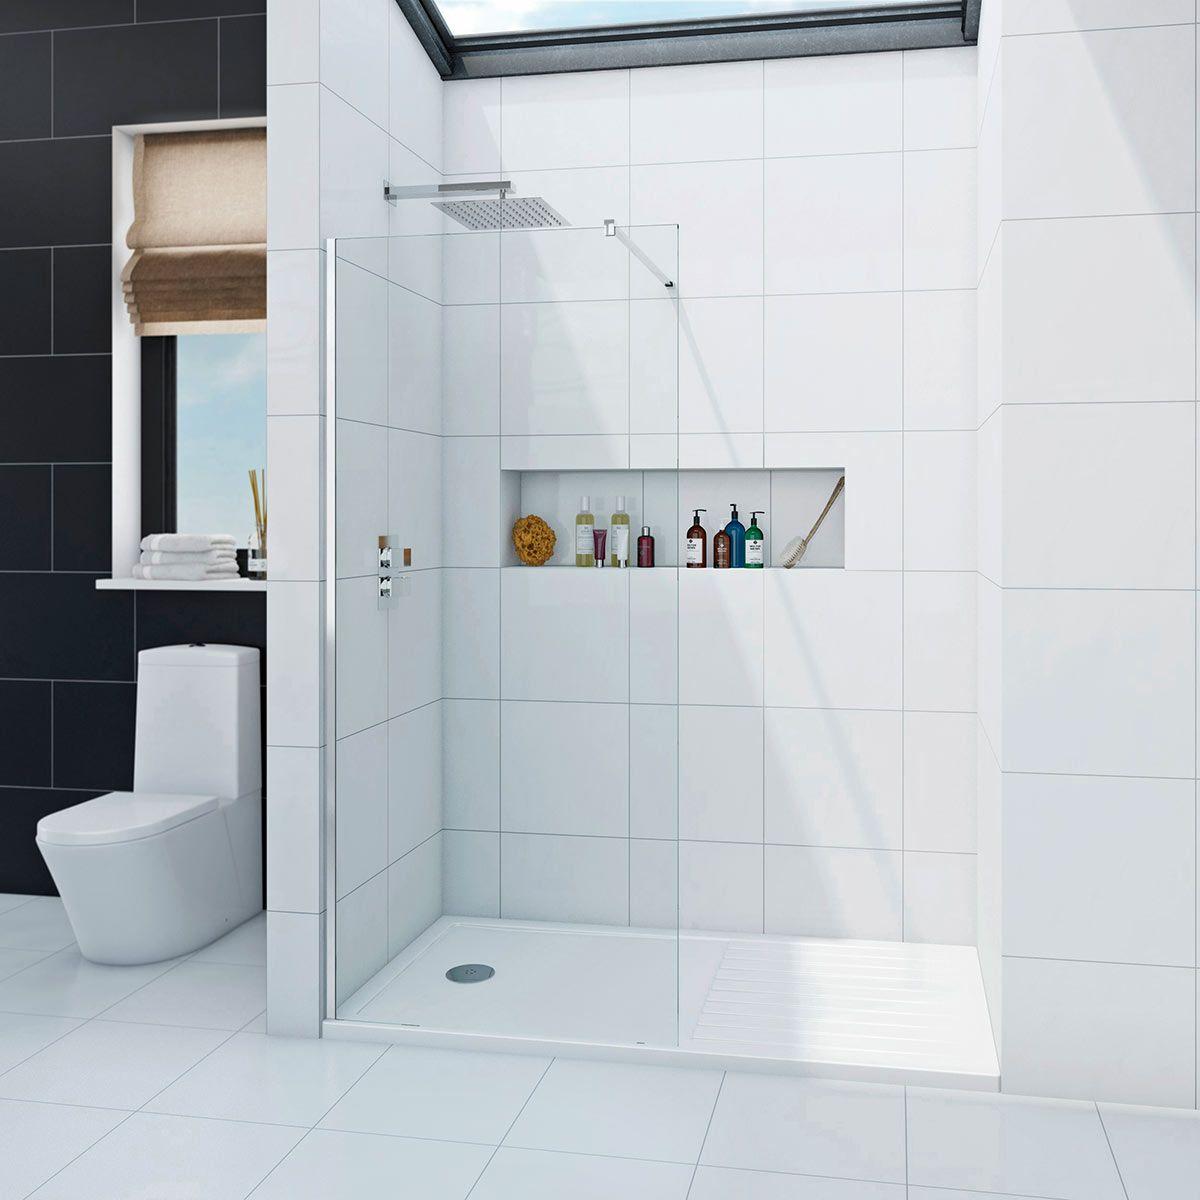 Awesome Walk In Shower Glass Panel Embellishment - Bathtub Ideas ...